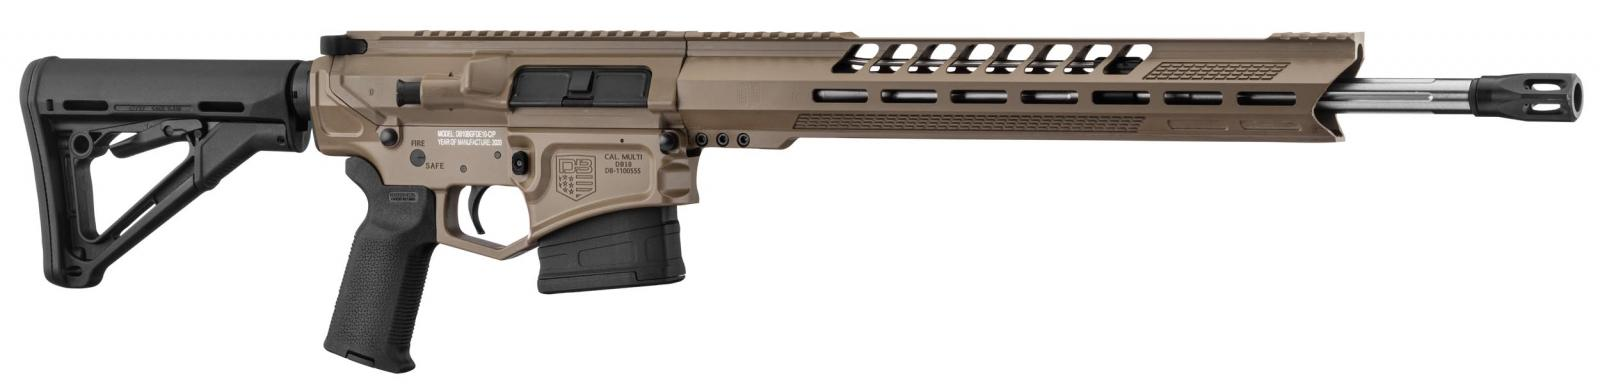 Carabine type AR10 DIAMONDBACK modèle DB10 18'' 308 Win